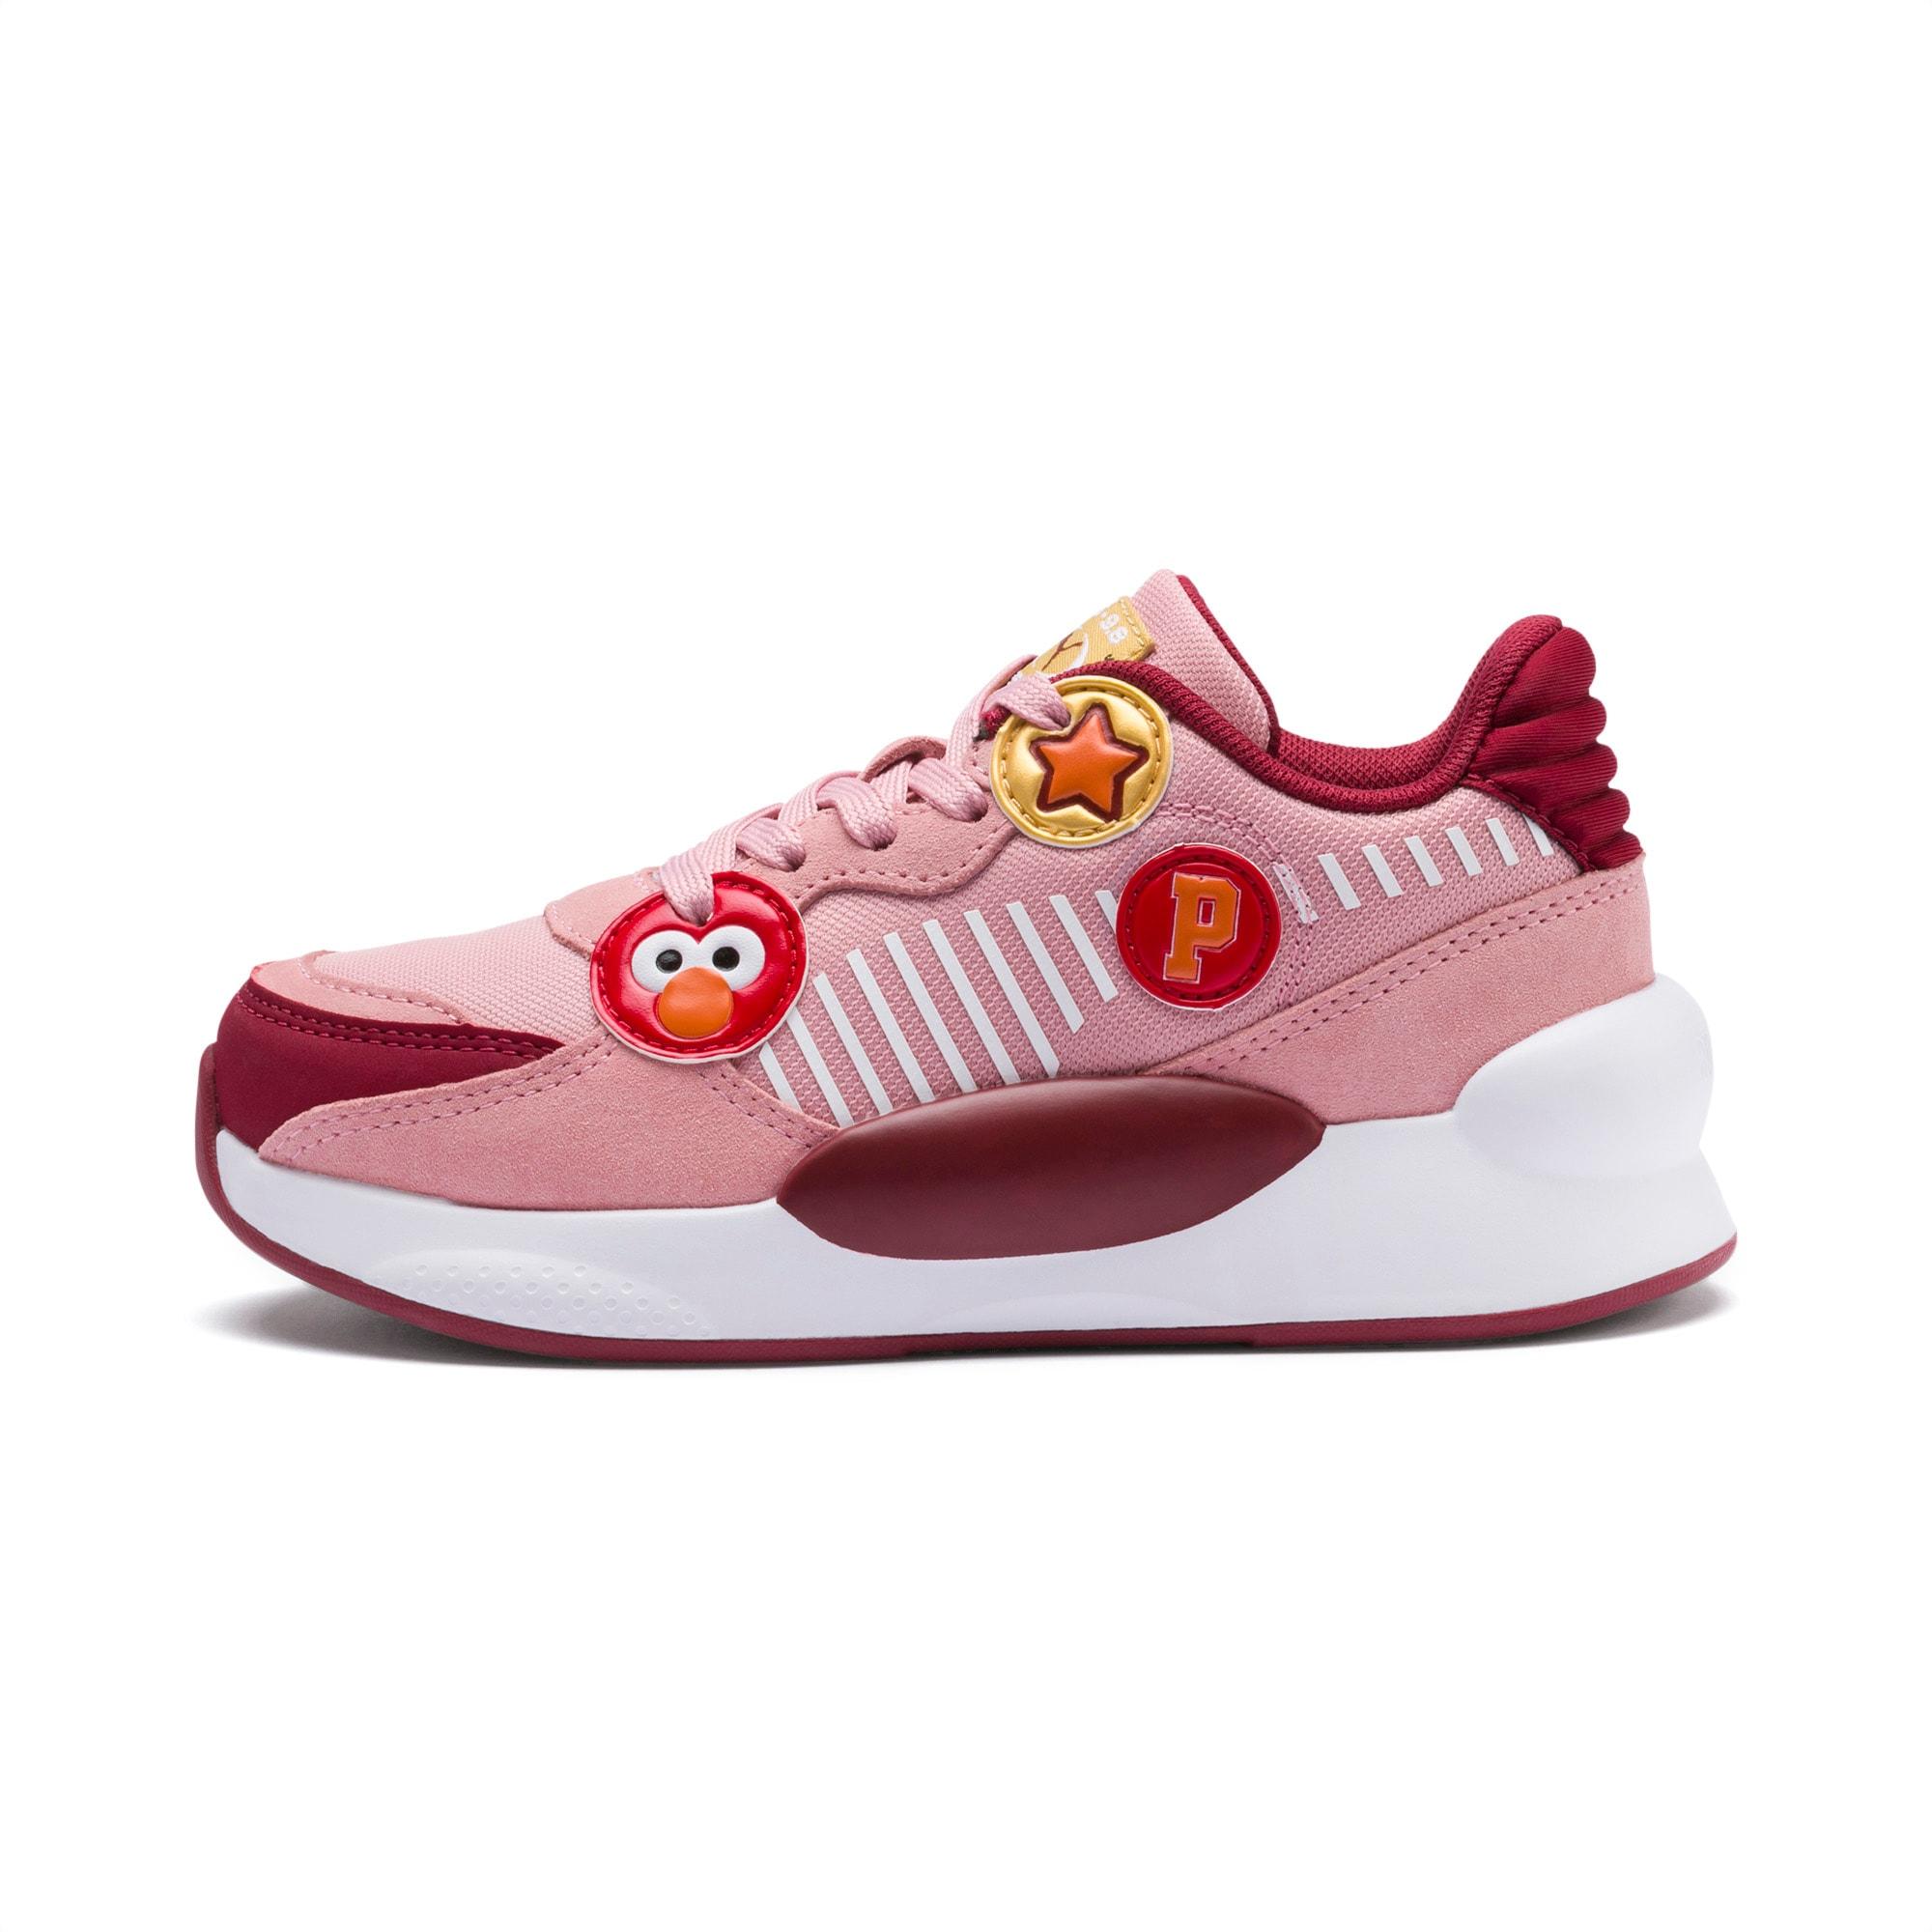 PUMA x SESAME STREET 50 RS 9.8 Little Kids' Shoes